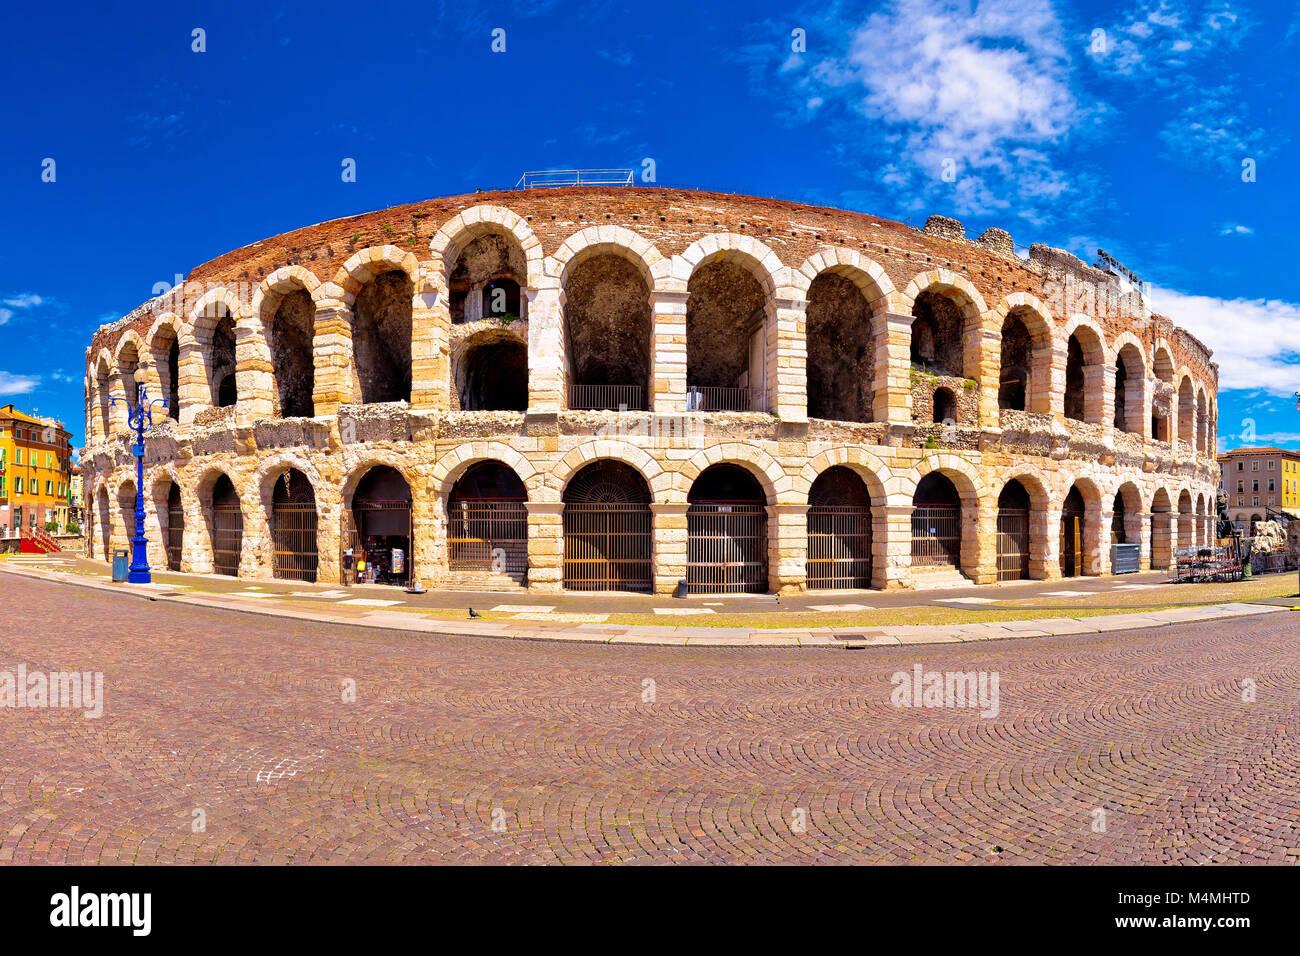 Roman amphitheatre Arena di Verona and Piazza Bra square panoramic view, landmark in Veneto region of Italy Stock Photo